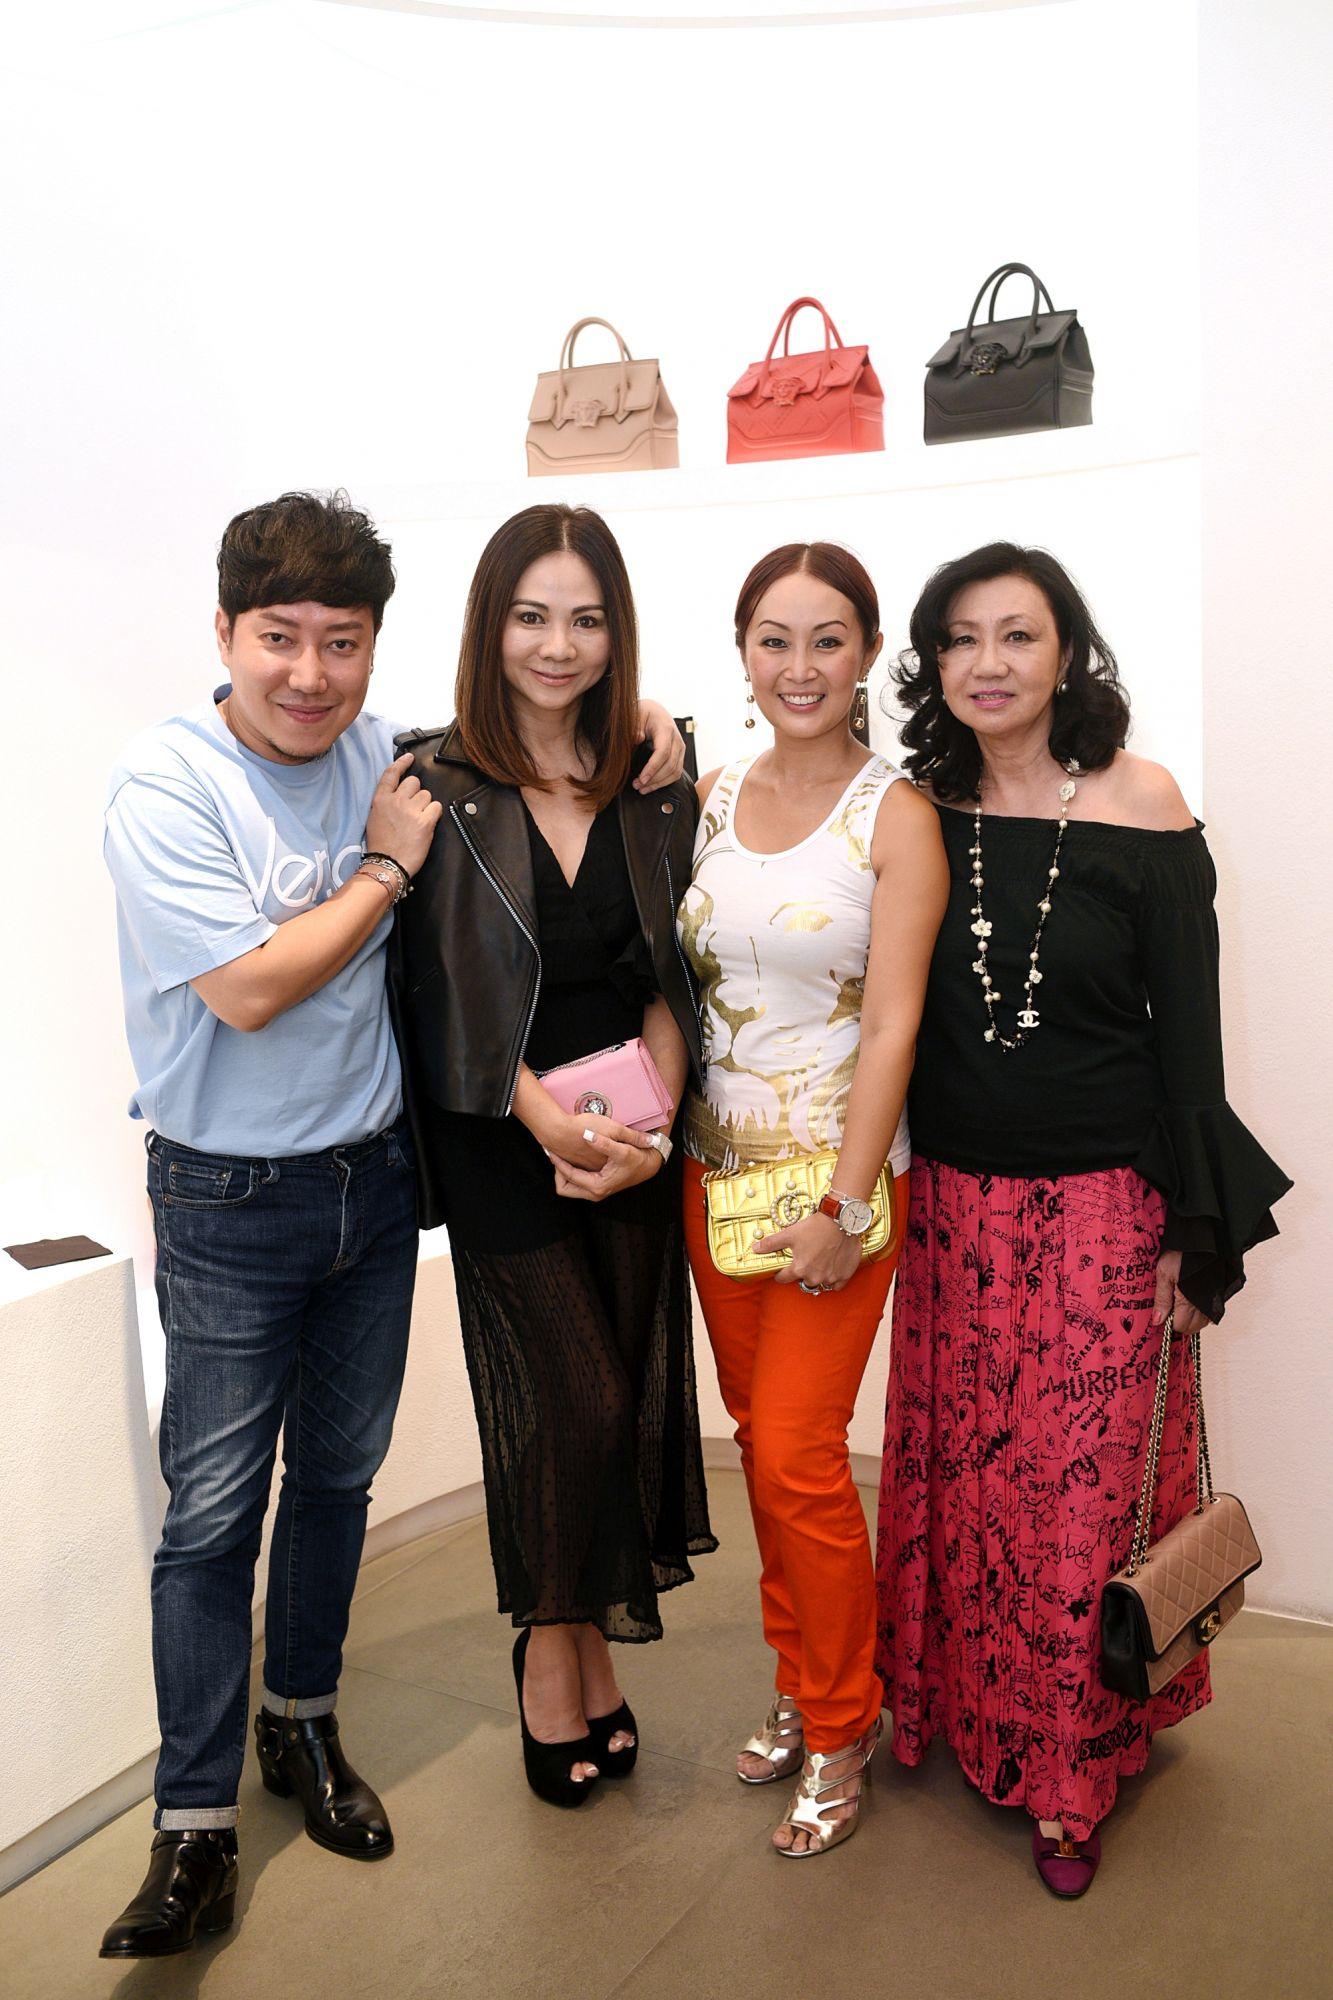 Desmond Lim, Jacelyn Lai, Serene Chua, Renee Tan